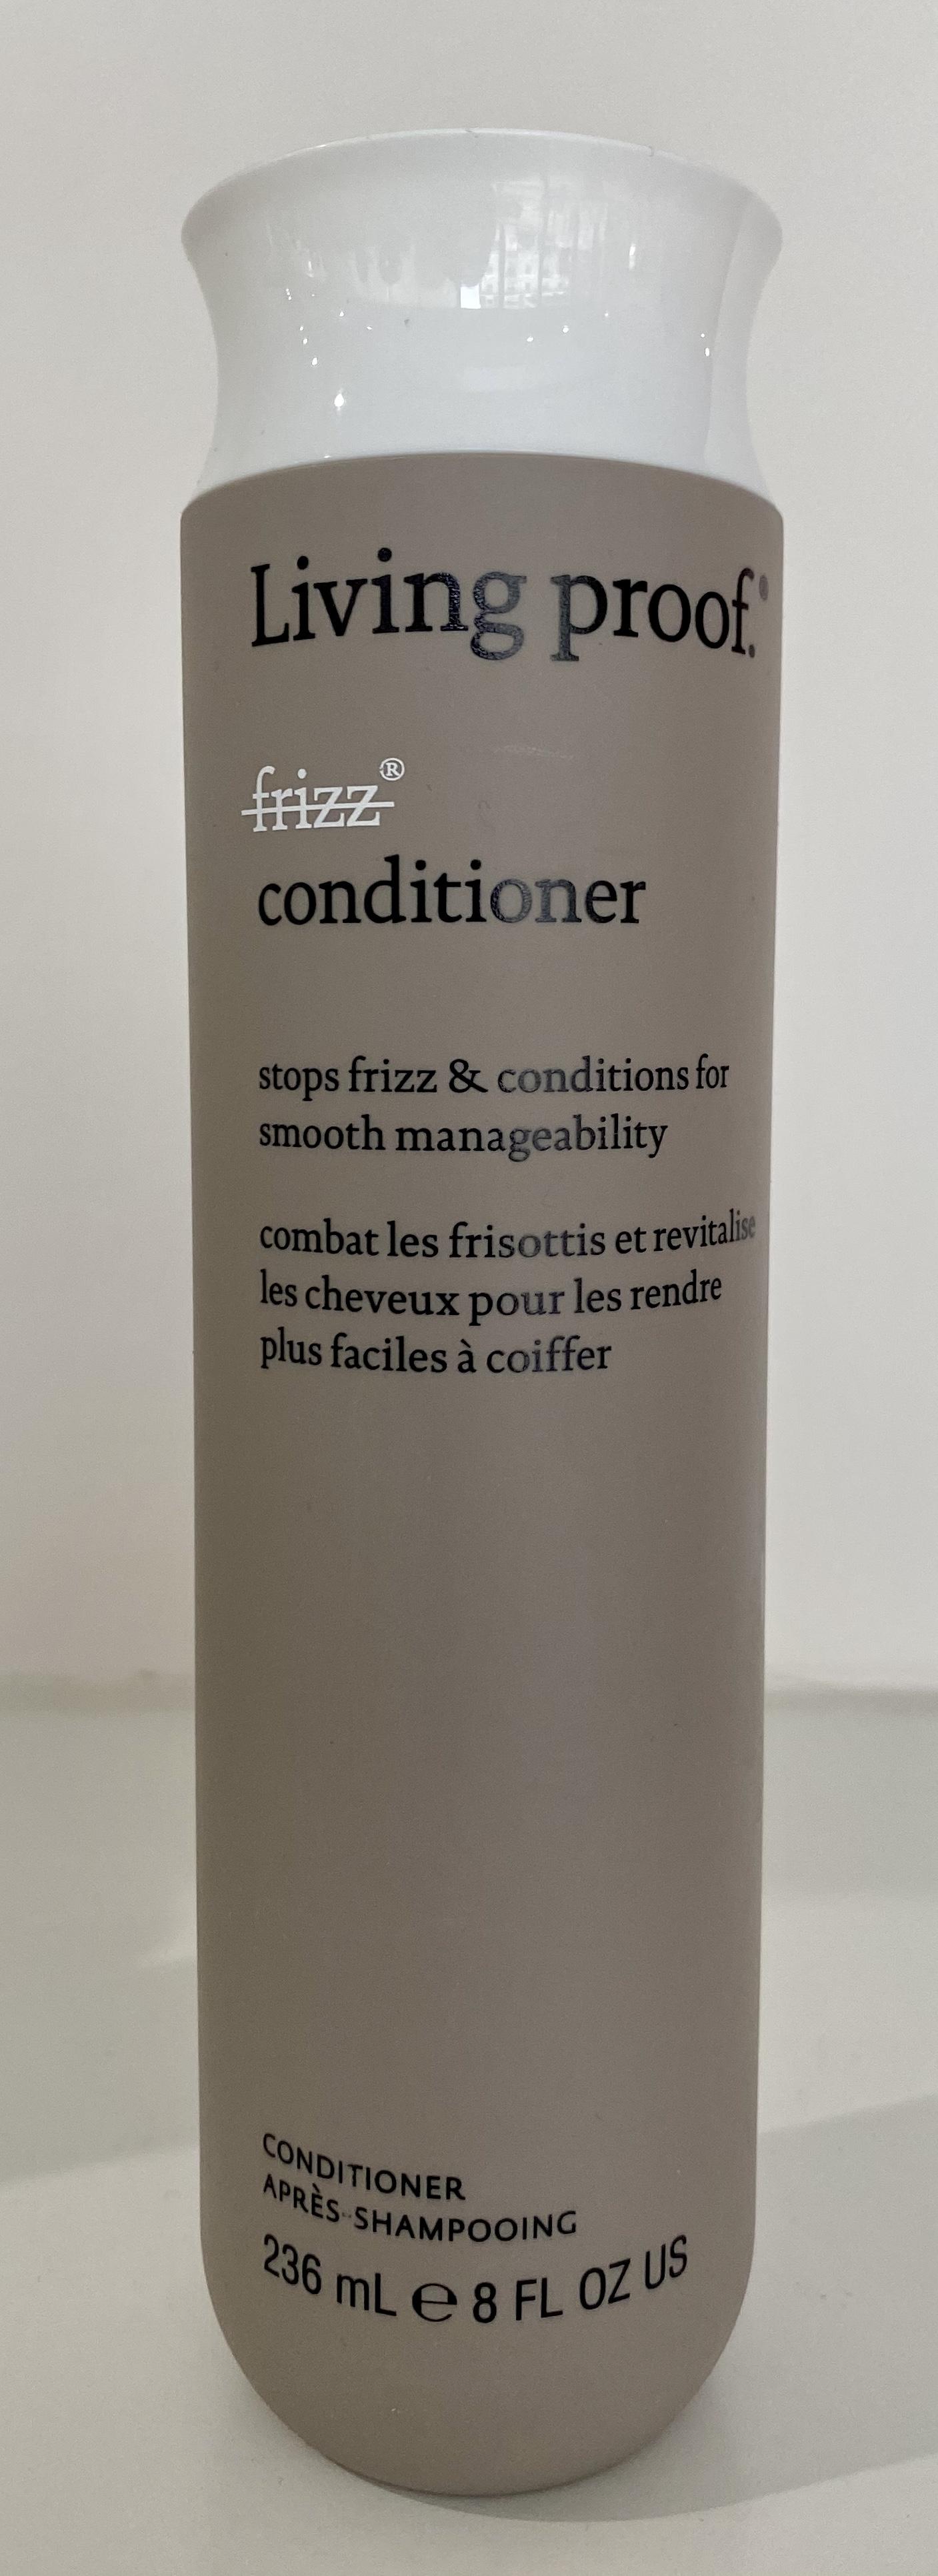 No Frizz Conditioner